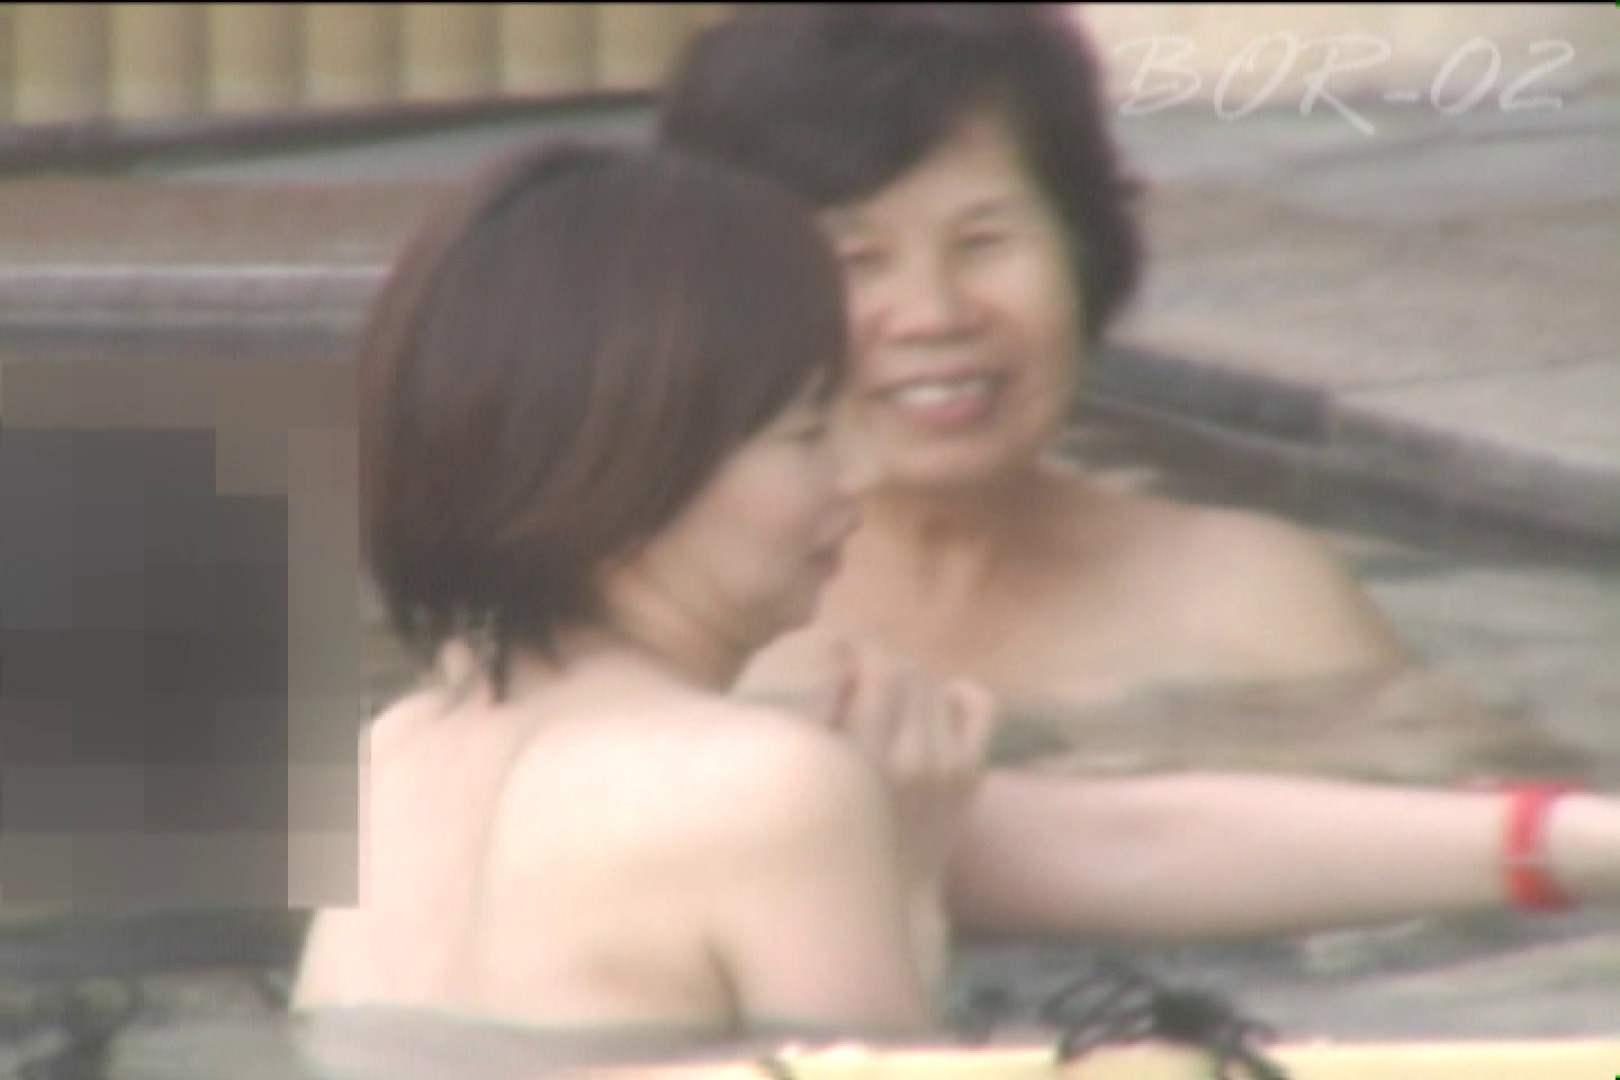 Aquaな露天風呂Vol.476 盗撮師作品 オマンコ無修正動画無料 85pic 35